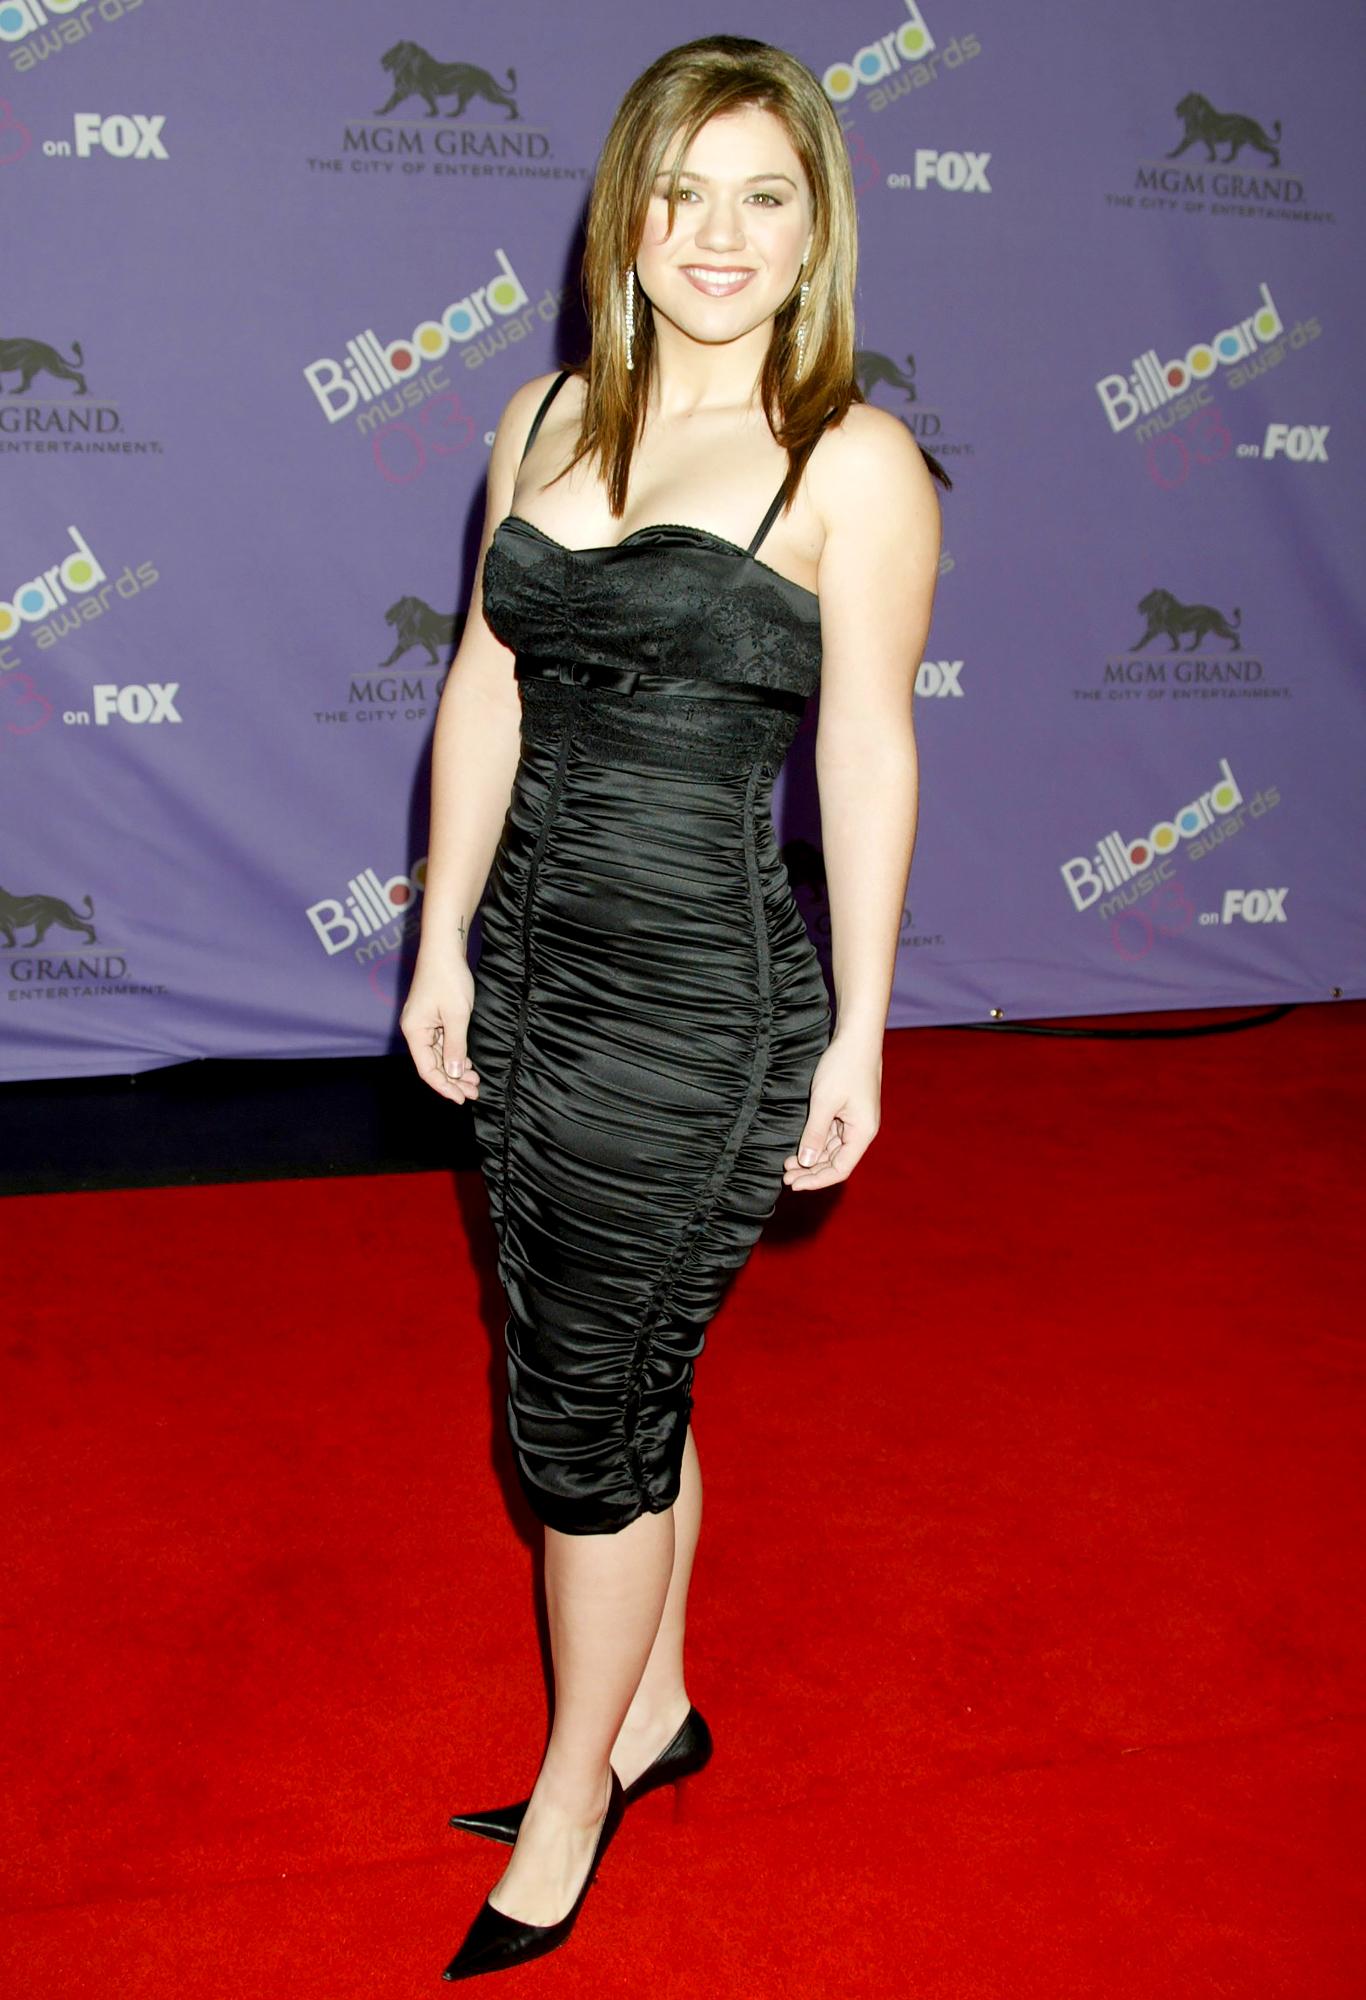 Kelly Clarkson 2003